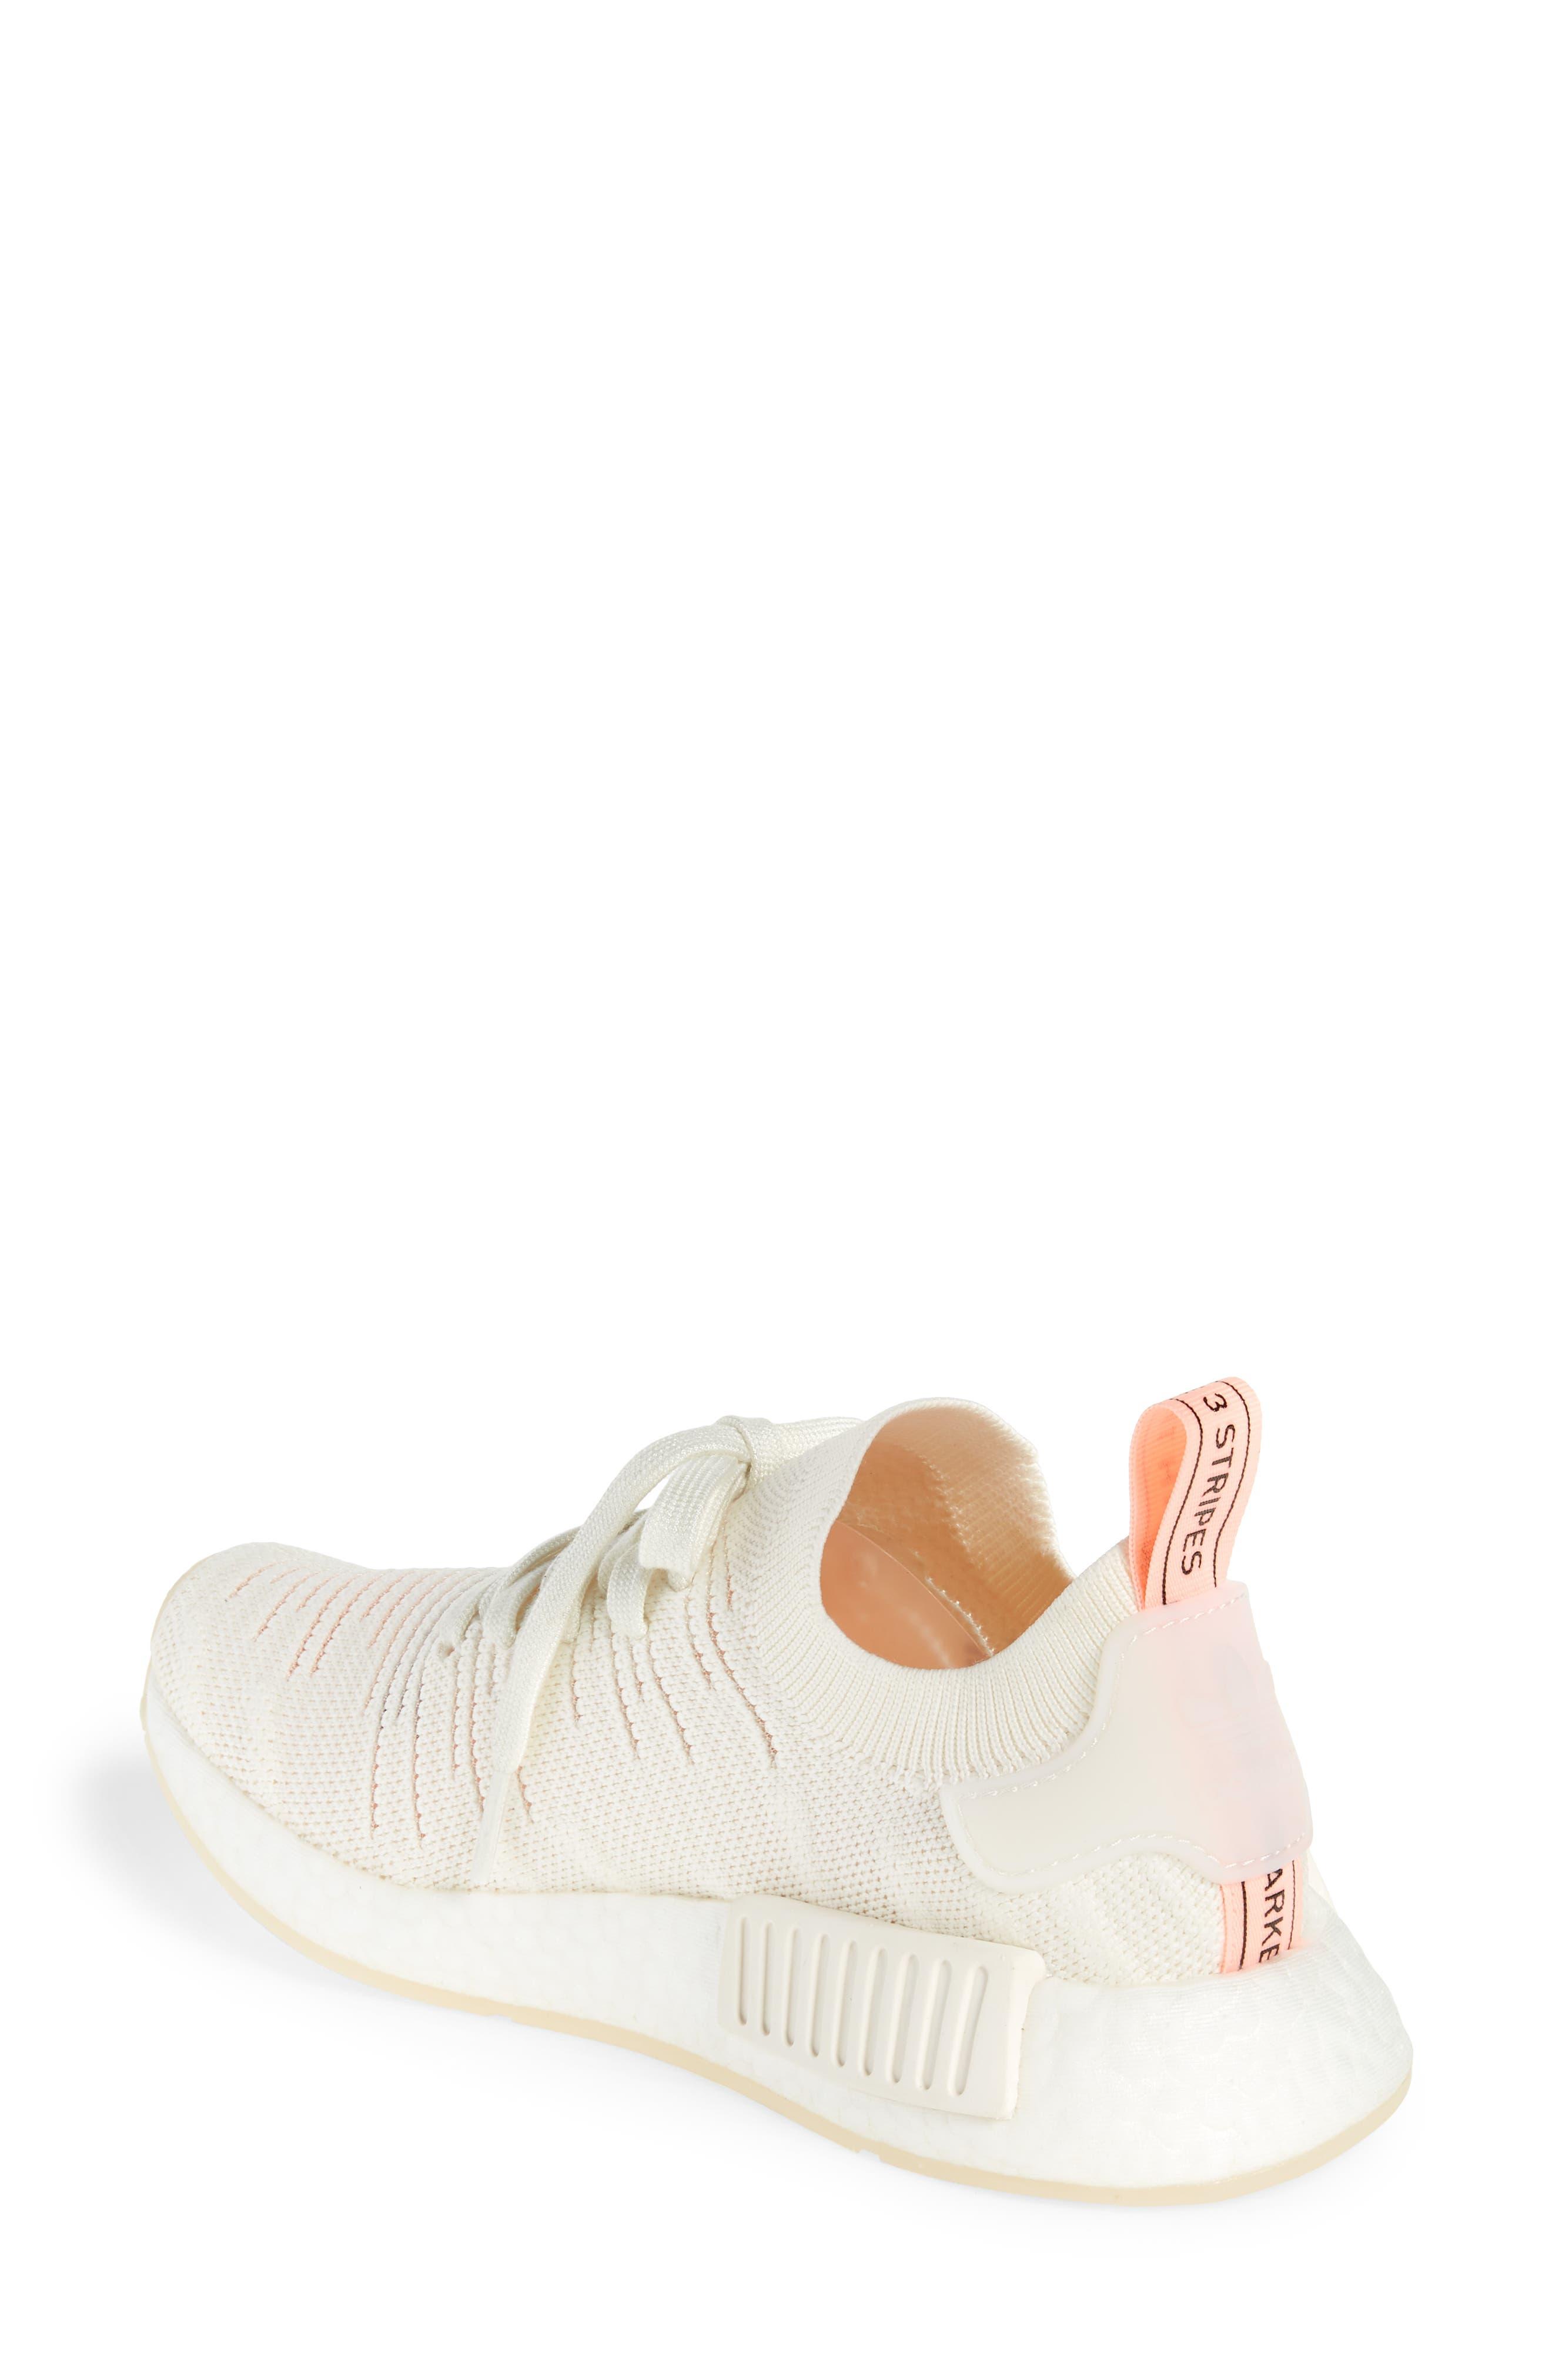 NMD R1 STLT Primeknit Sneaker,                             Alternate thumbnail 2, color,                             100